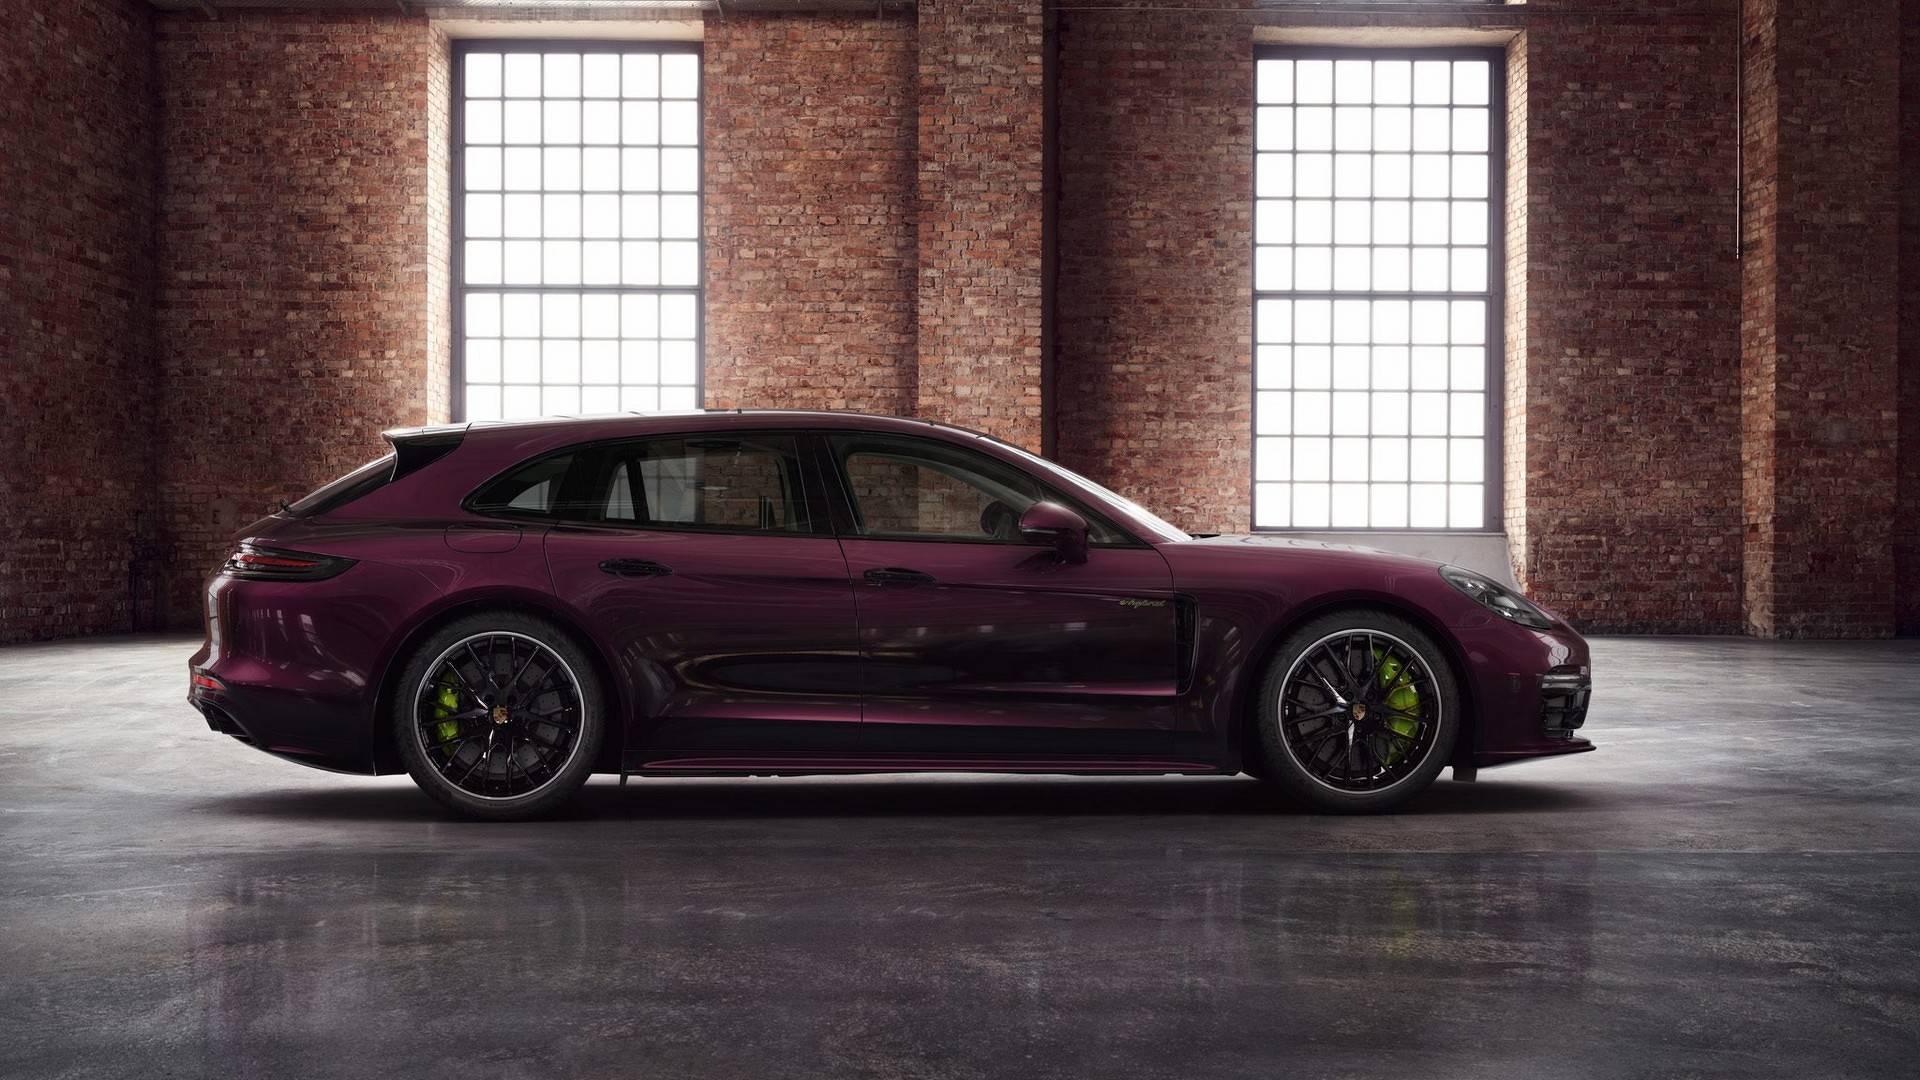 Porsche Panamera Turbo S E Hybrid Sport Turismo In Amethyst Metallic 2389040